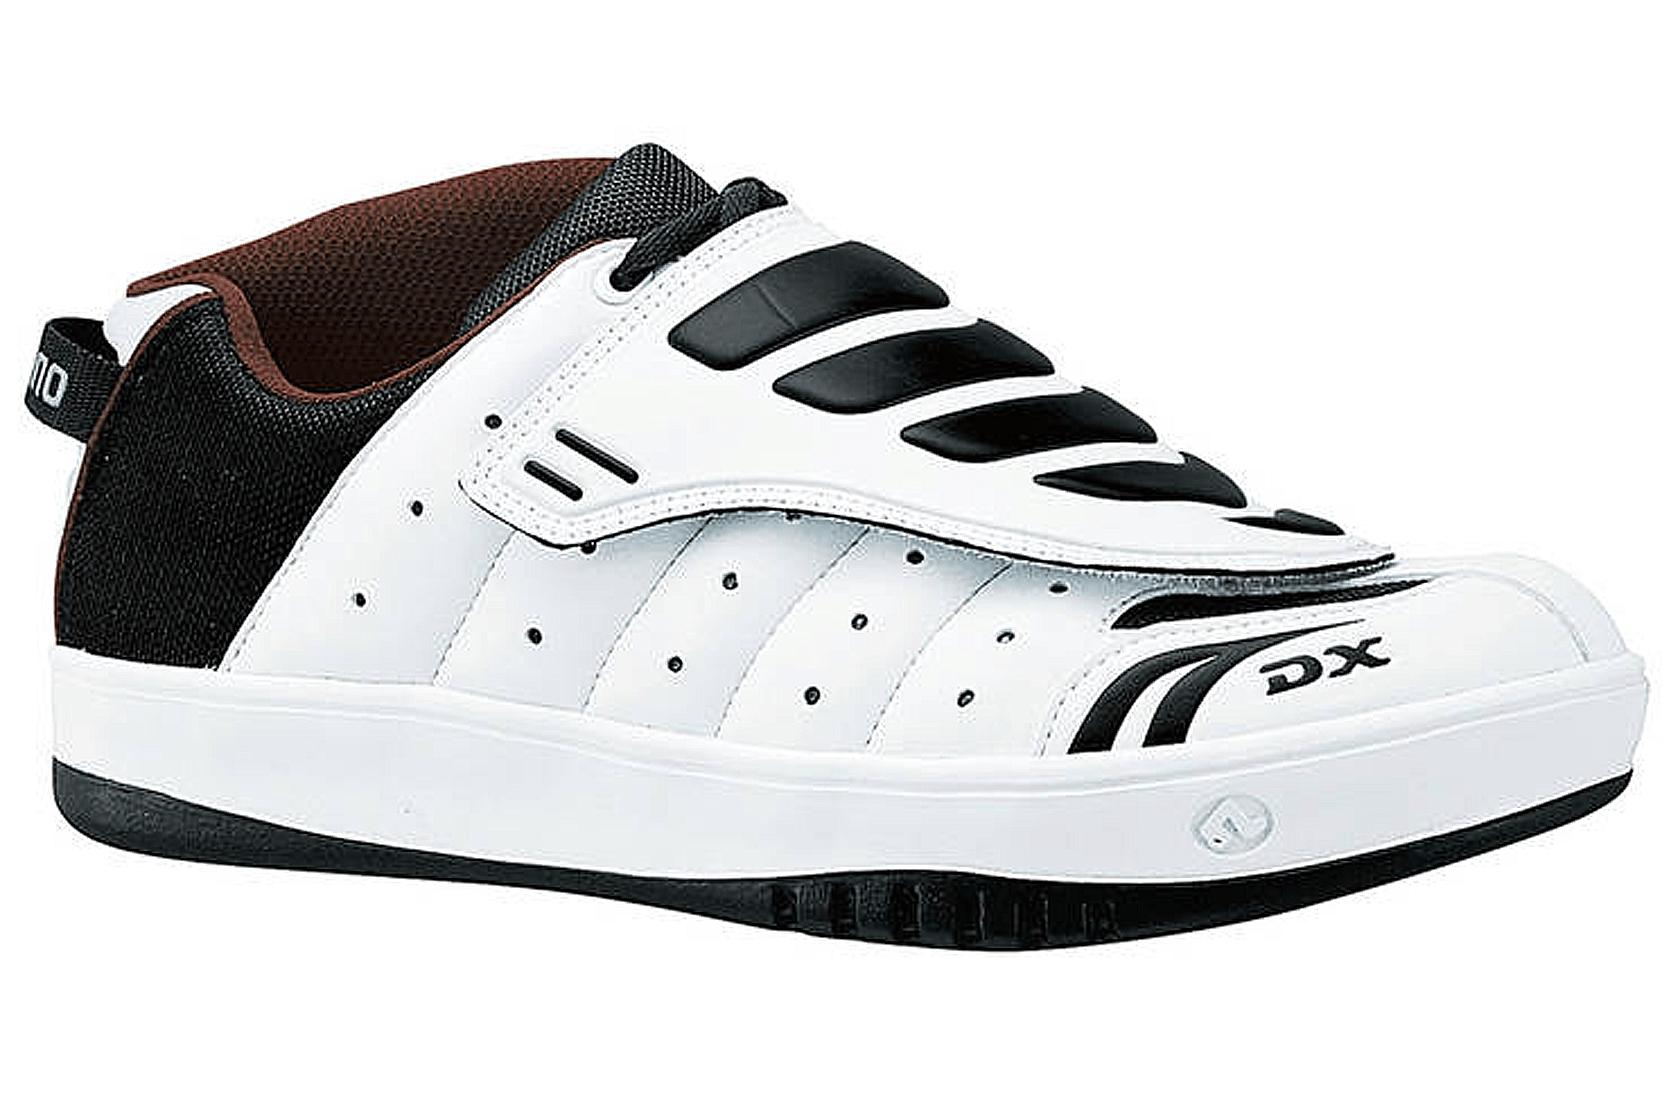 DesignApplause Shimano Mp66w Dx Spd Shoes